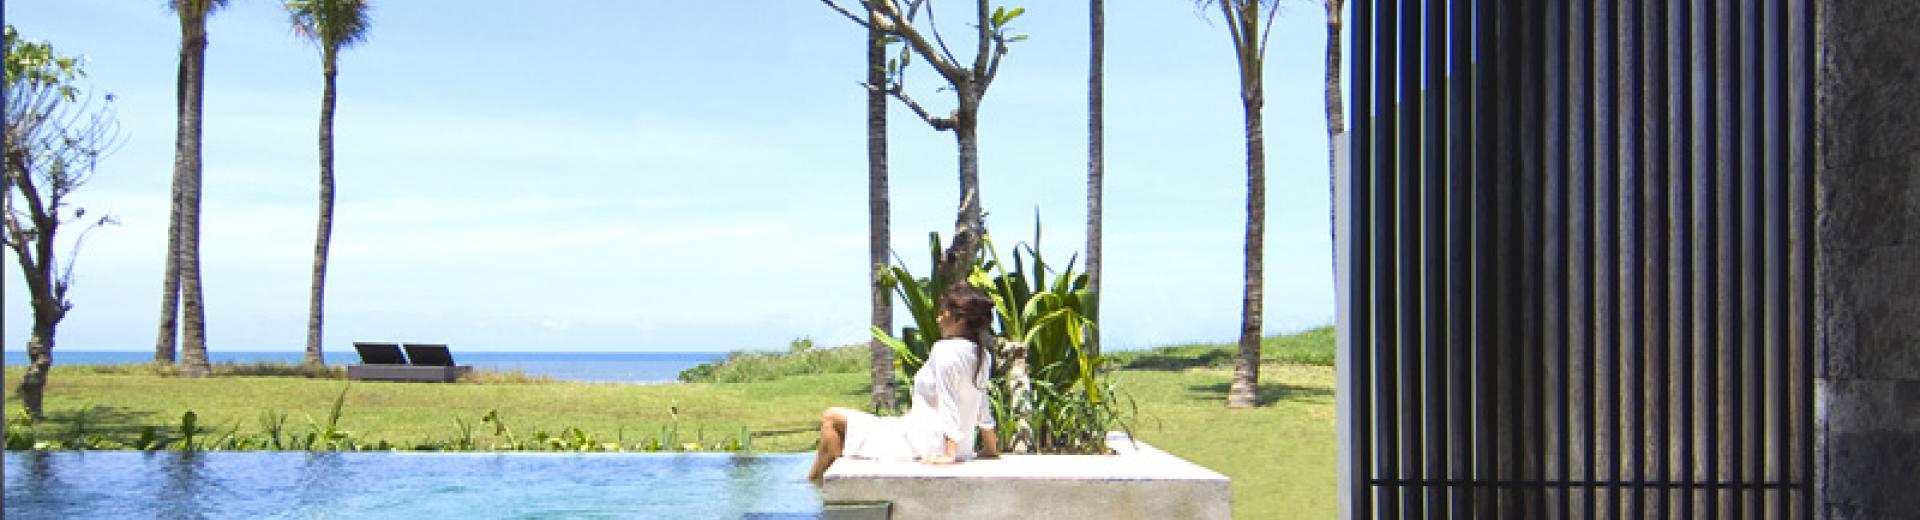 SMY Alila Soori Beach Villa with Pool